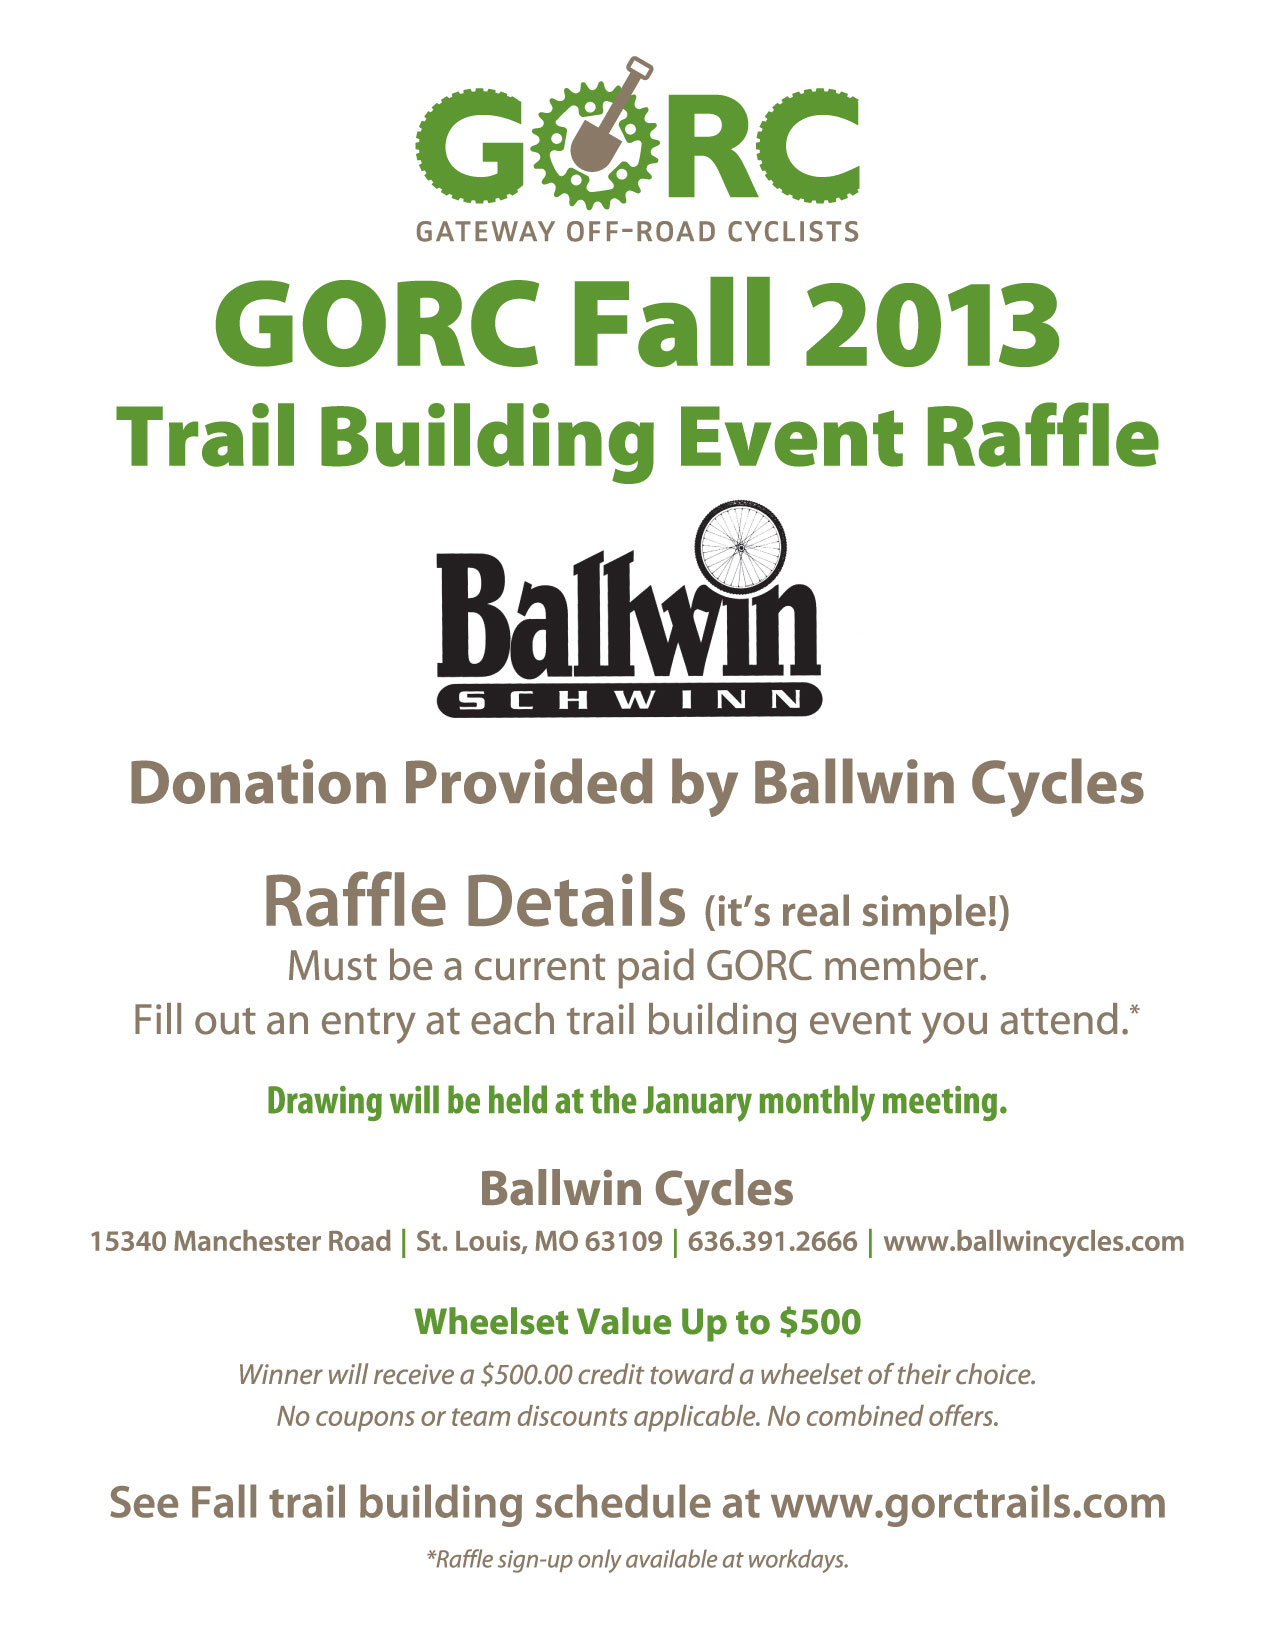 2013 Fall Trail Building Raffle sponsored by Ballwin Cycles